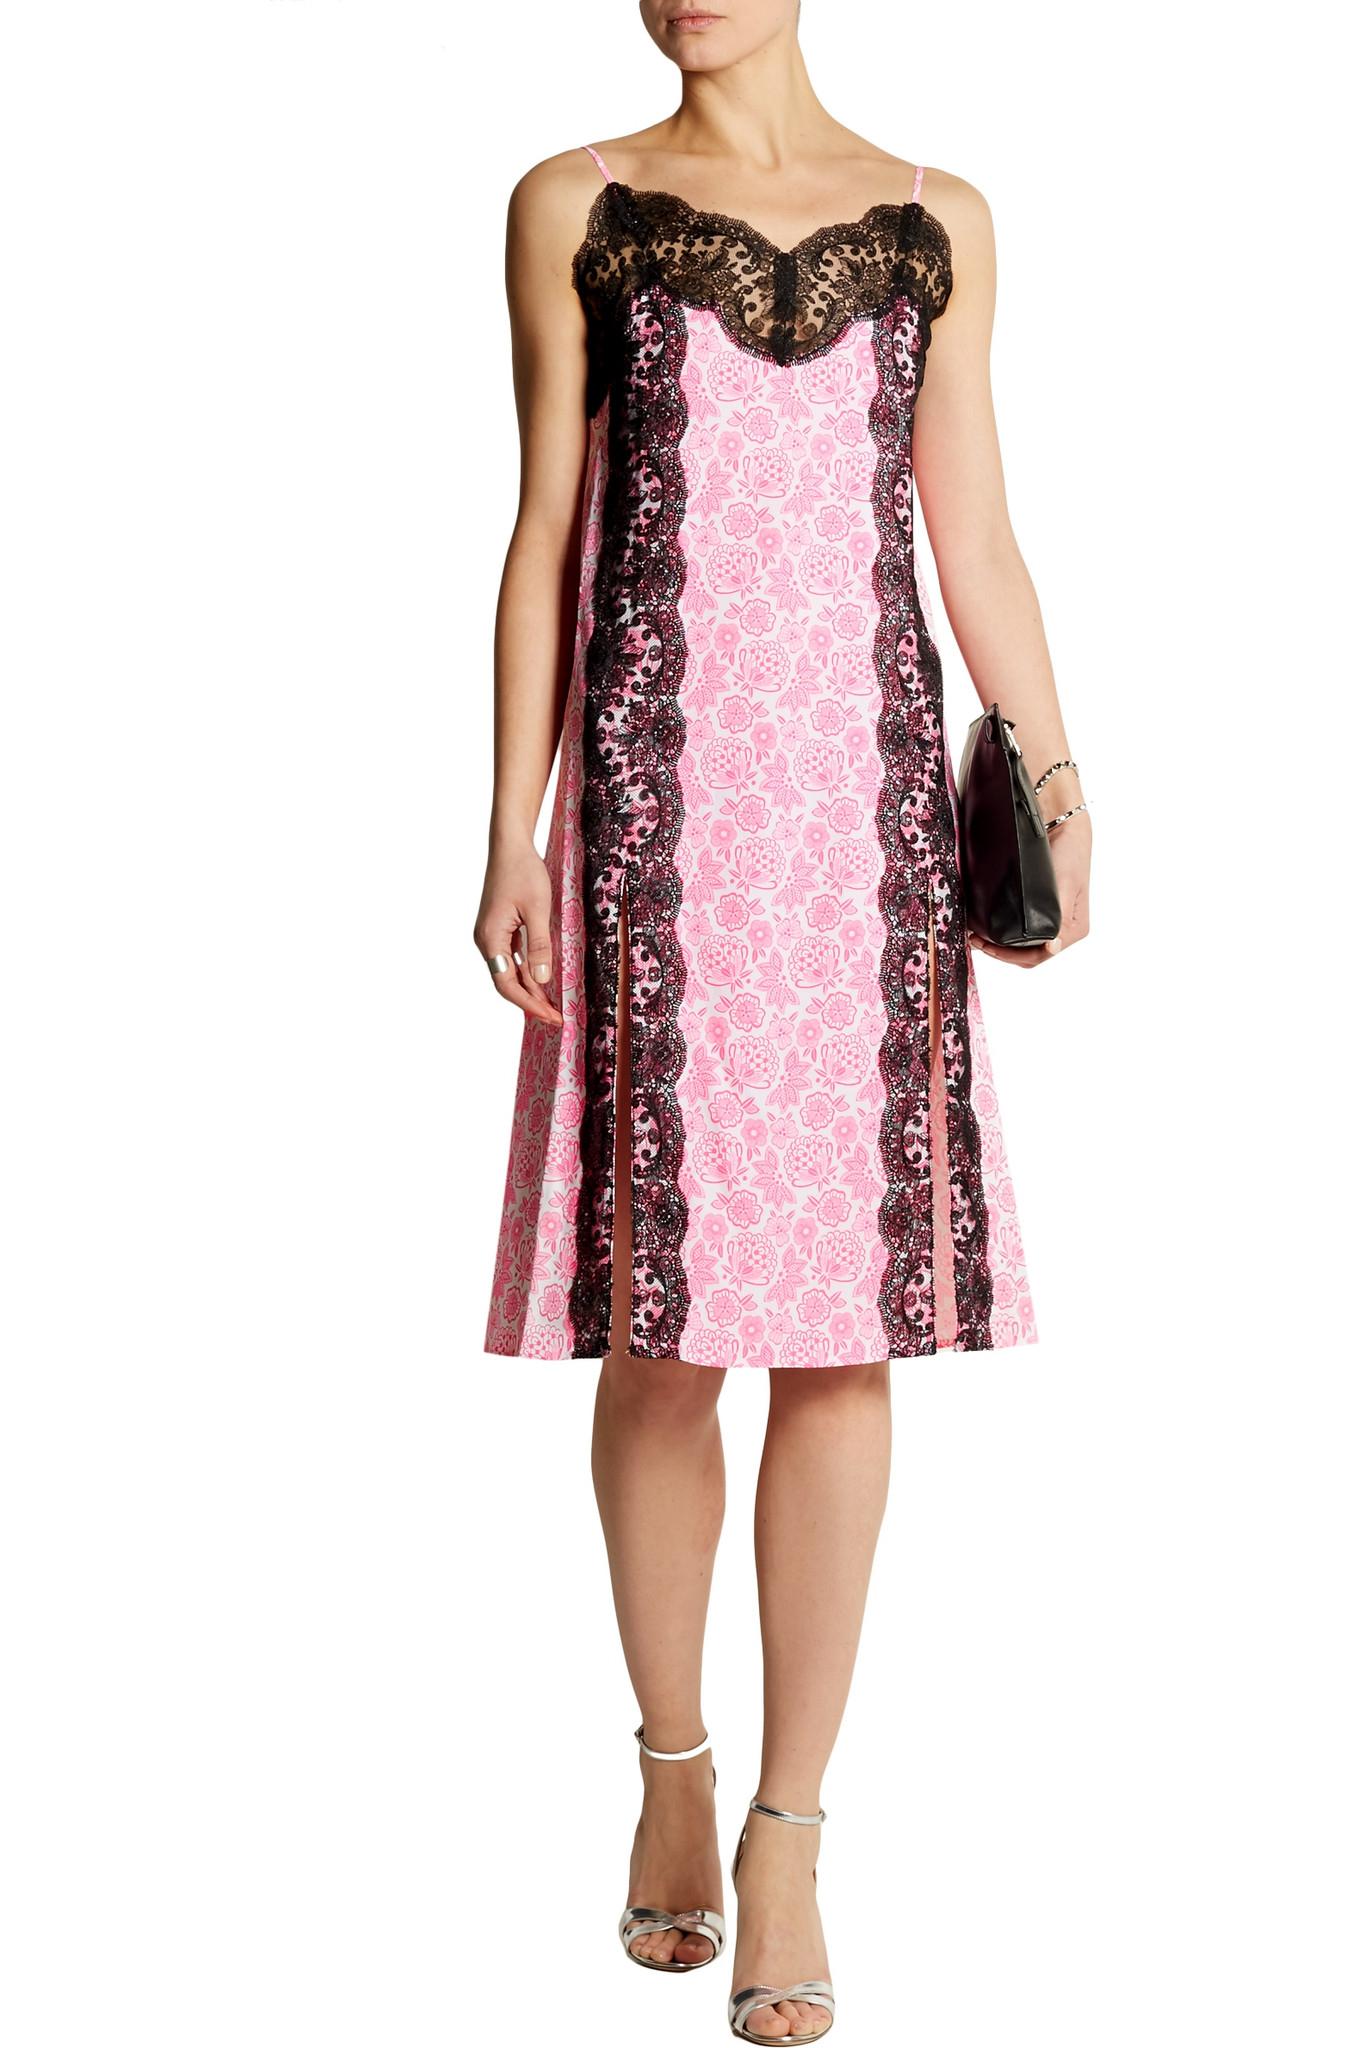 Laced-trimmed crepe dress Christopher Kane Outlet Big Sale Cheap Best iZyNa